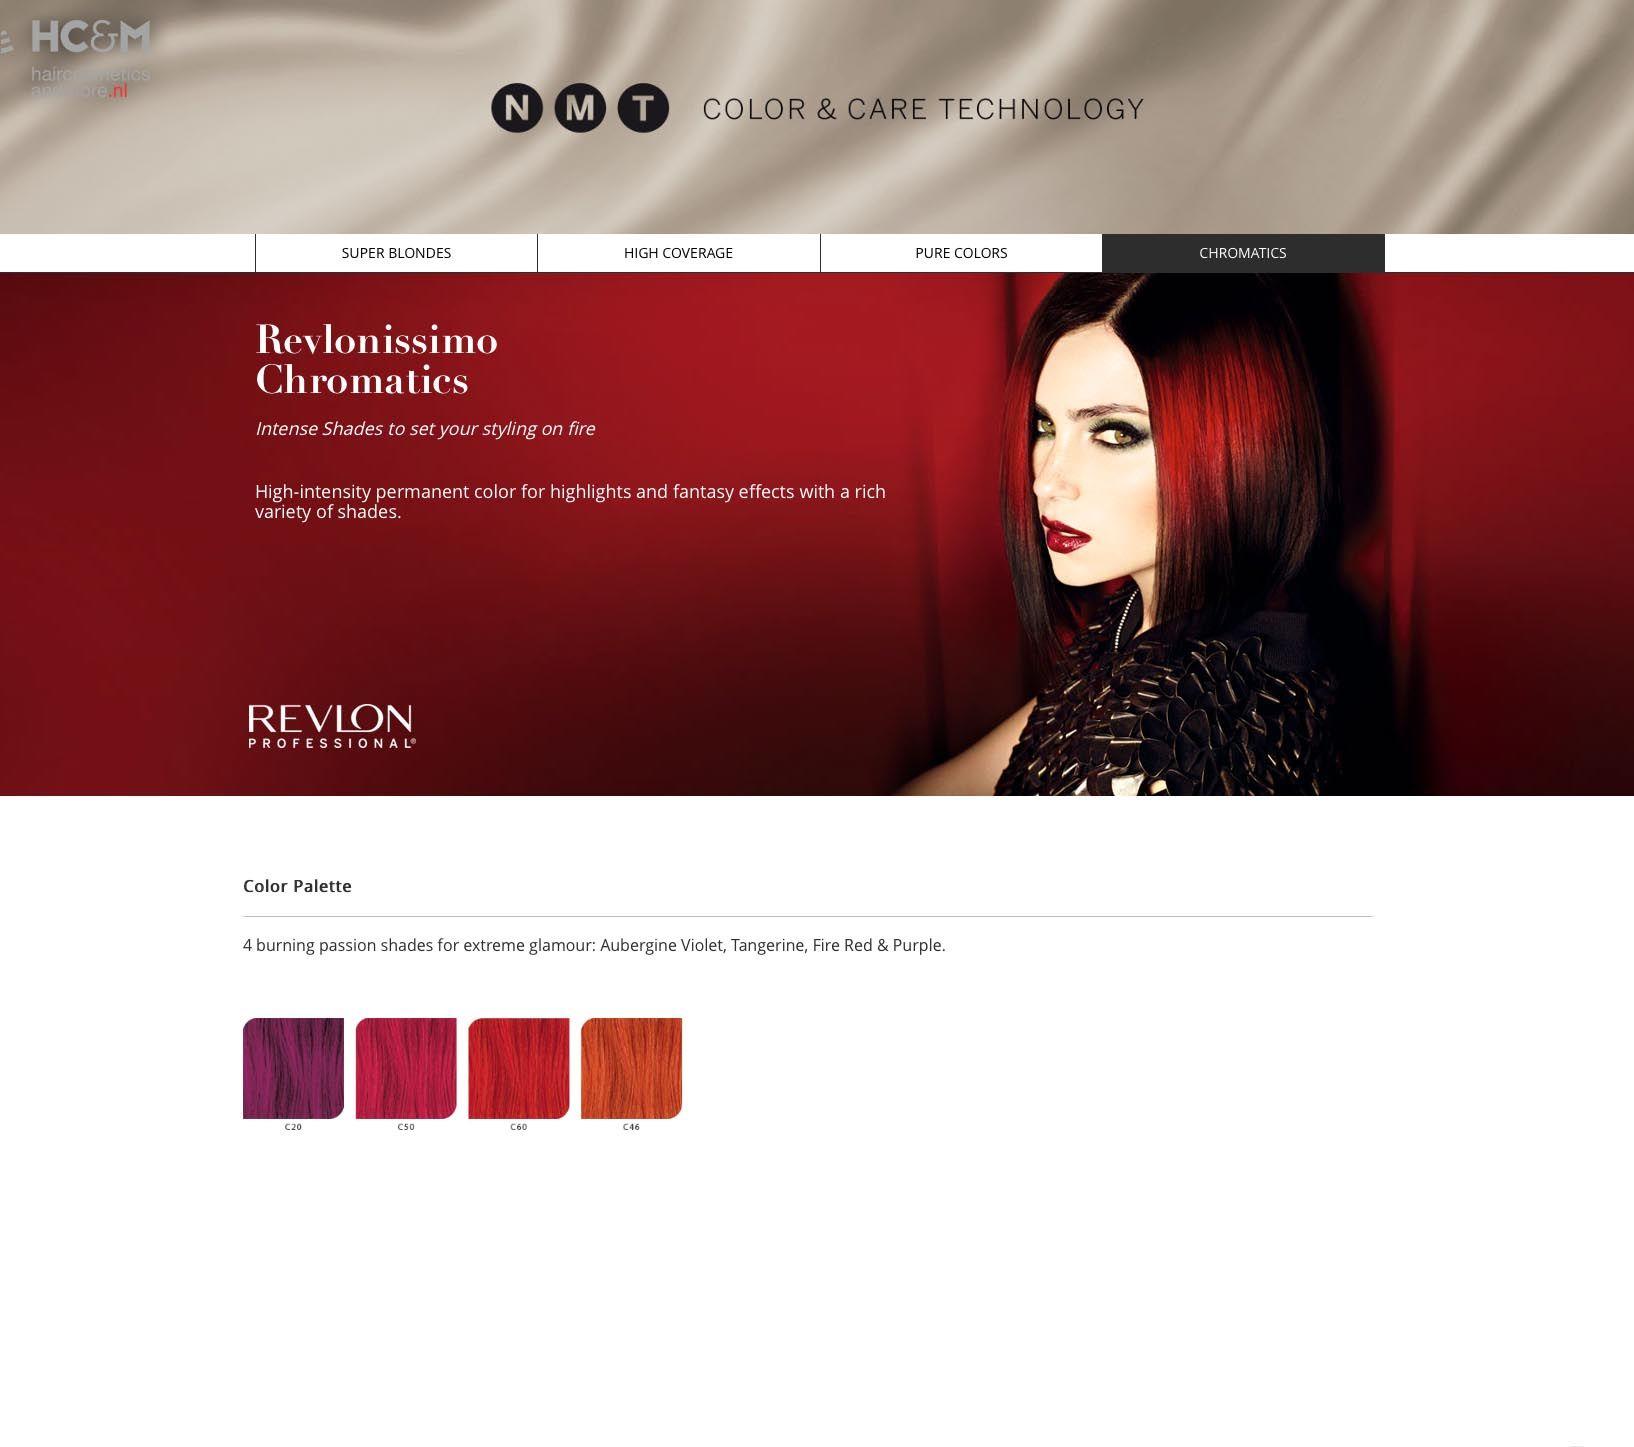 Revlon professional revlonissimo nmt color palette chromatics revlon professional revlonissimo nmt color palette chromatics nvjuhfo Images